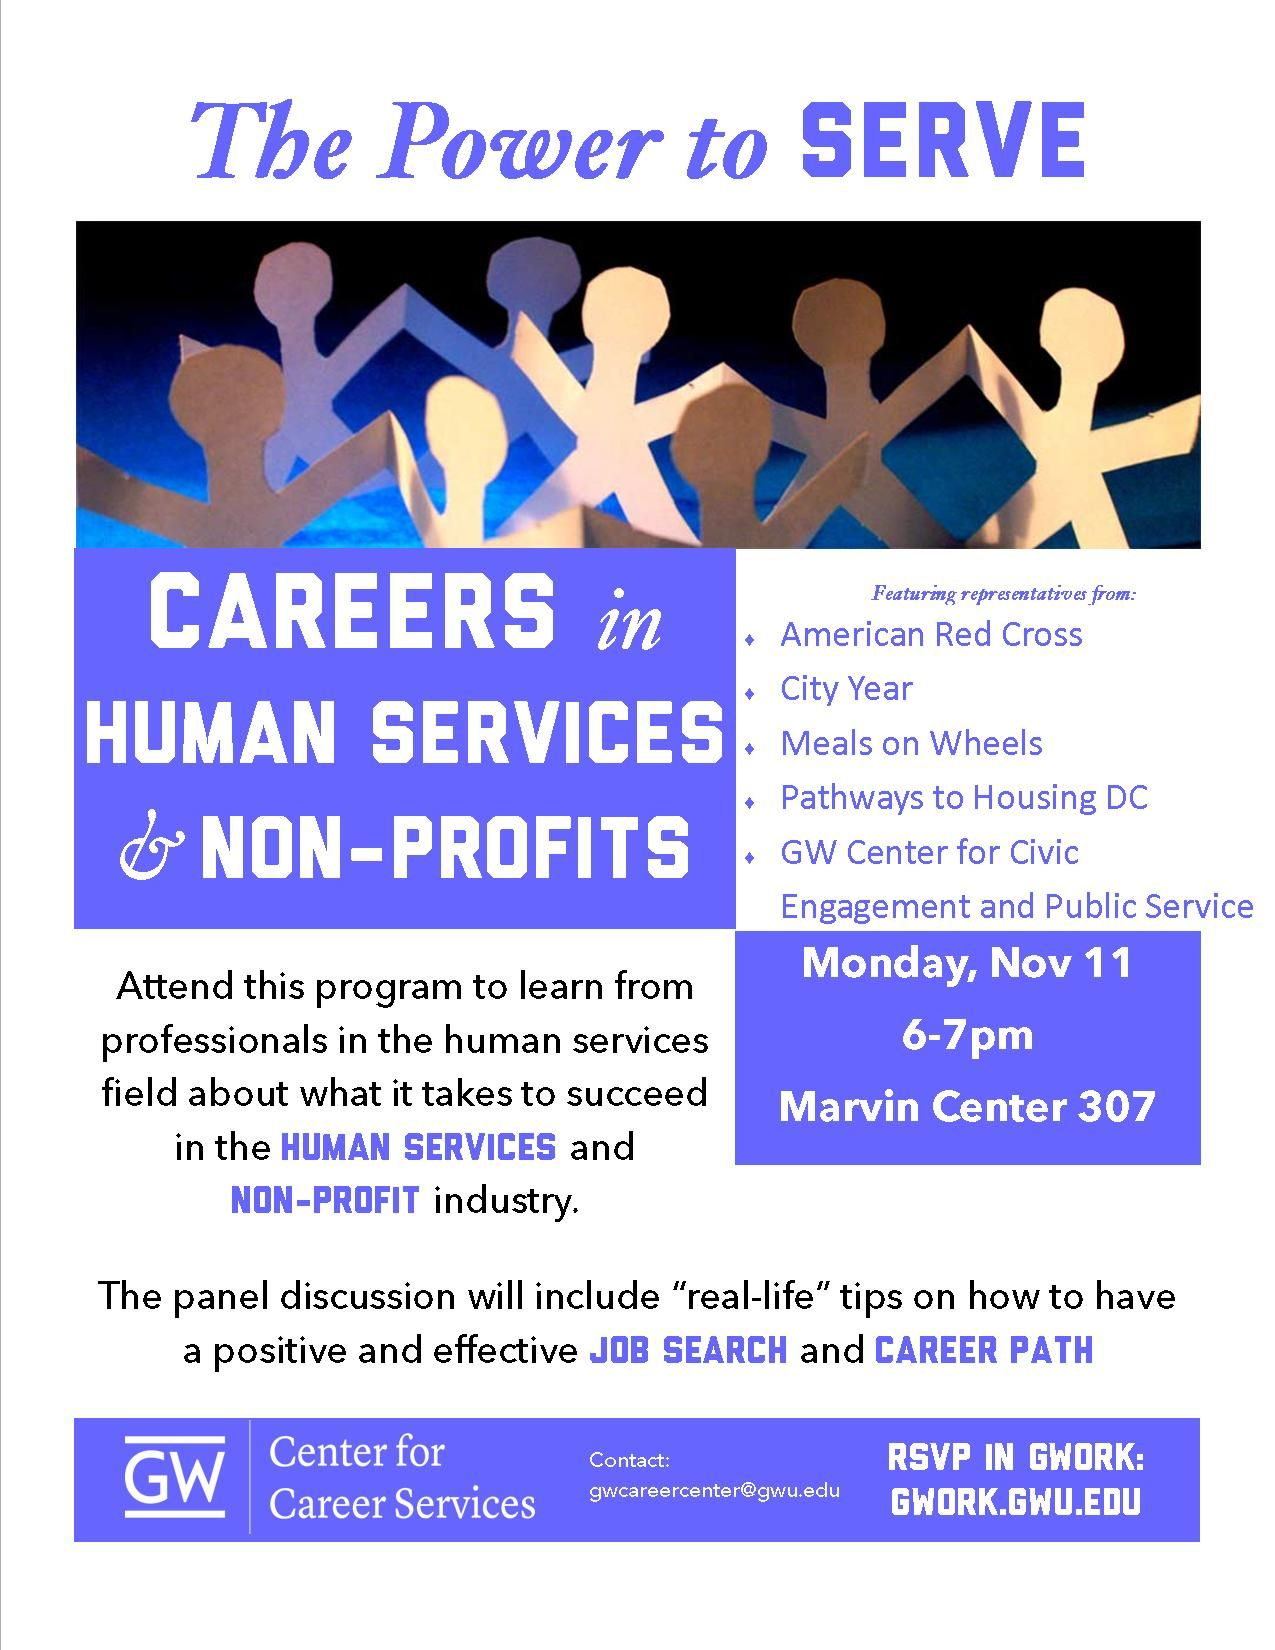 Human Services & NonProfits Human services, Service jobs